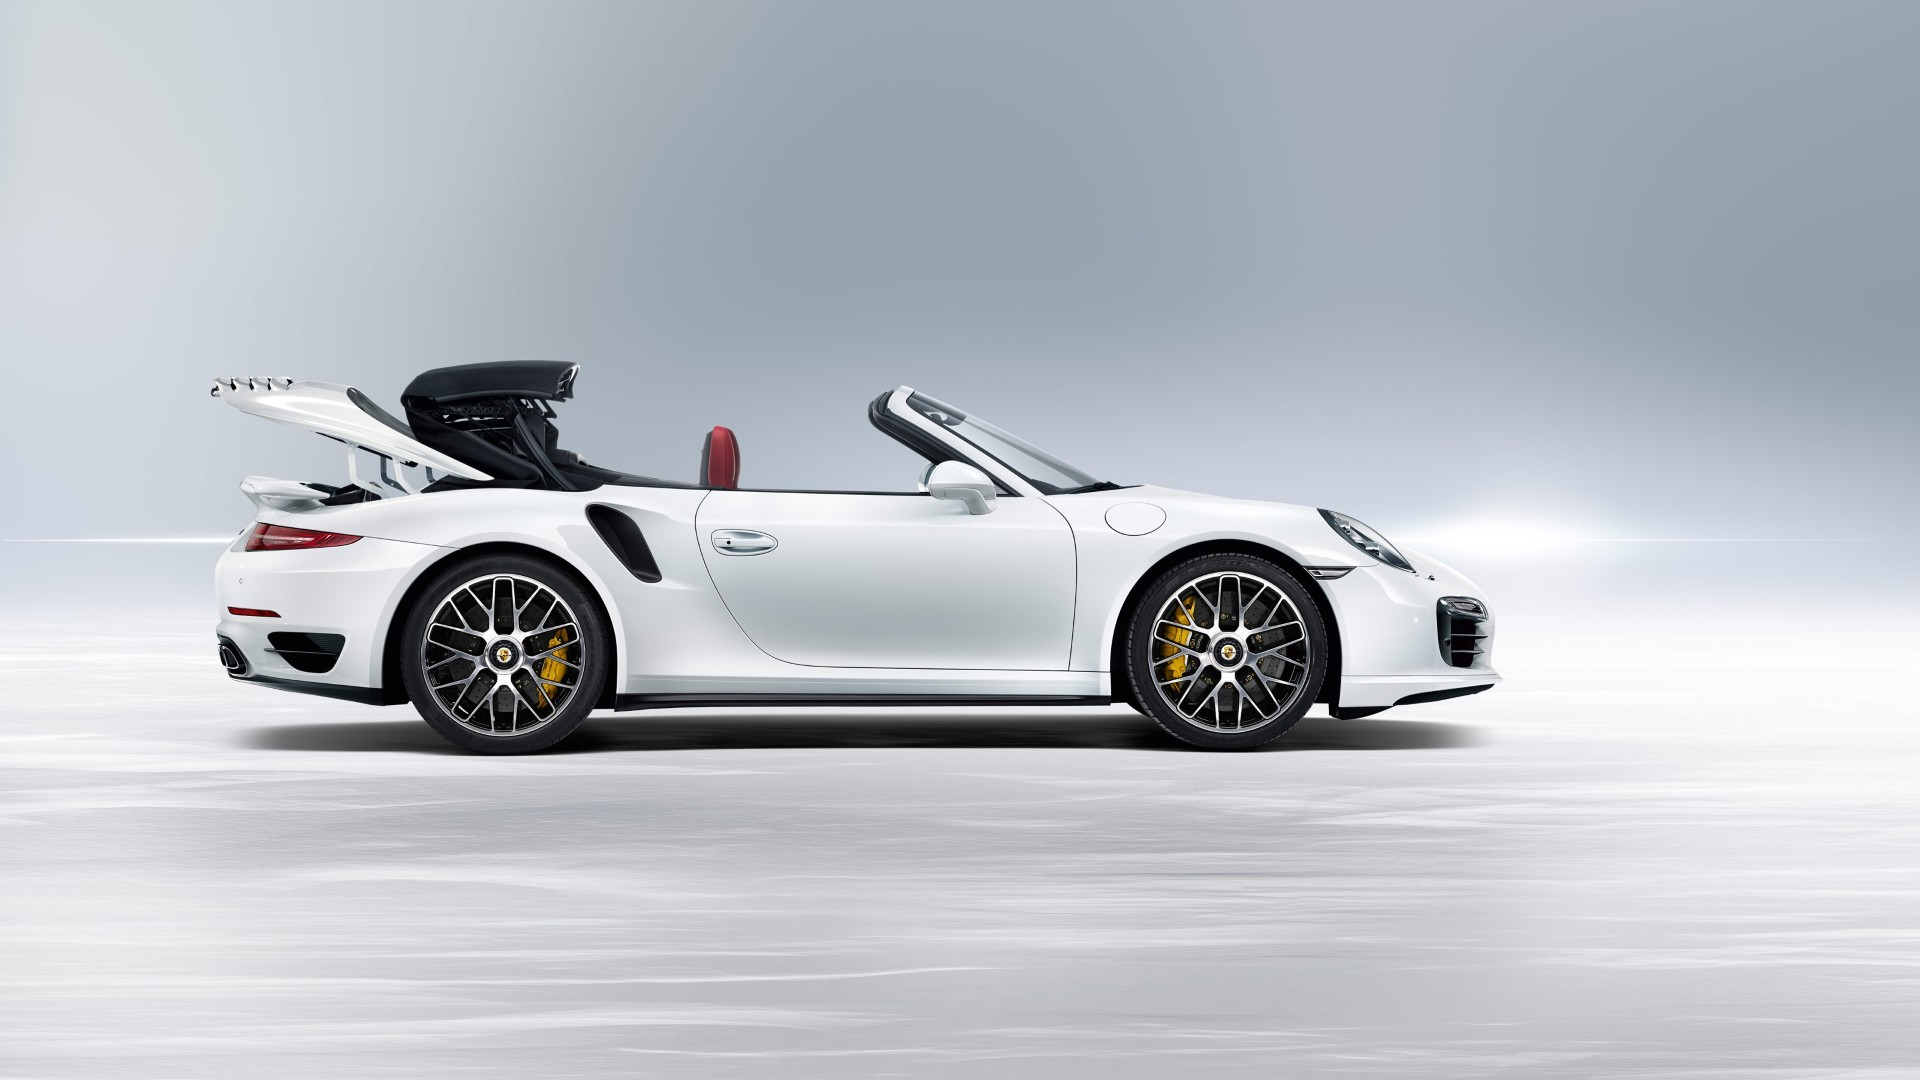 porsche 911 turbo s cabriolet 991 specs photos 2013 2014 2015 2016 autoevolution. Black Bedroom Furniture Sets. Home Design Ideas